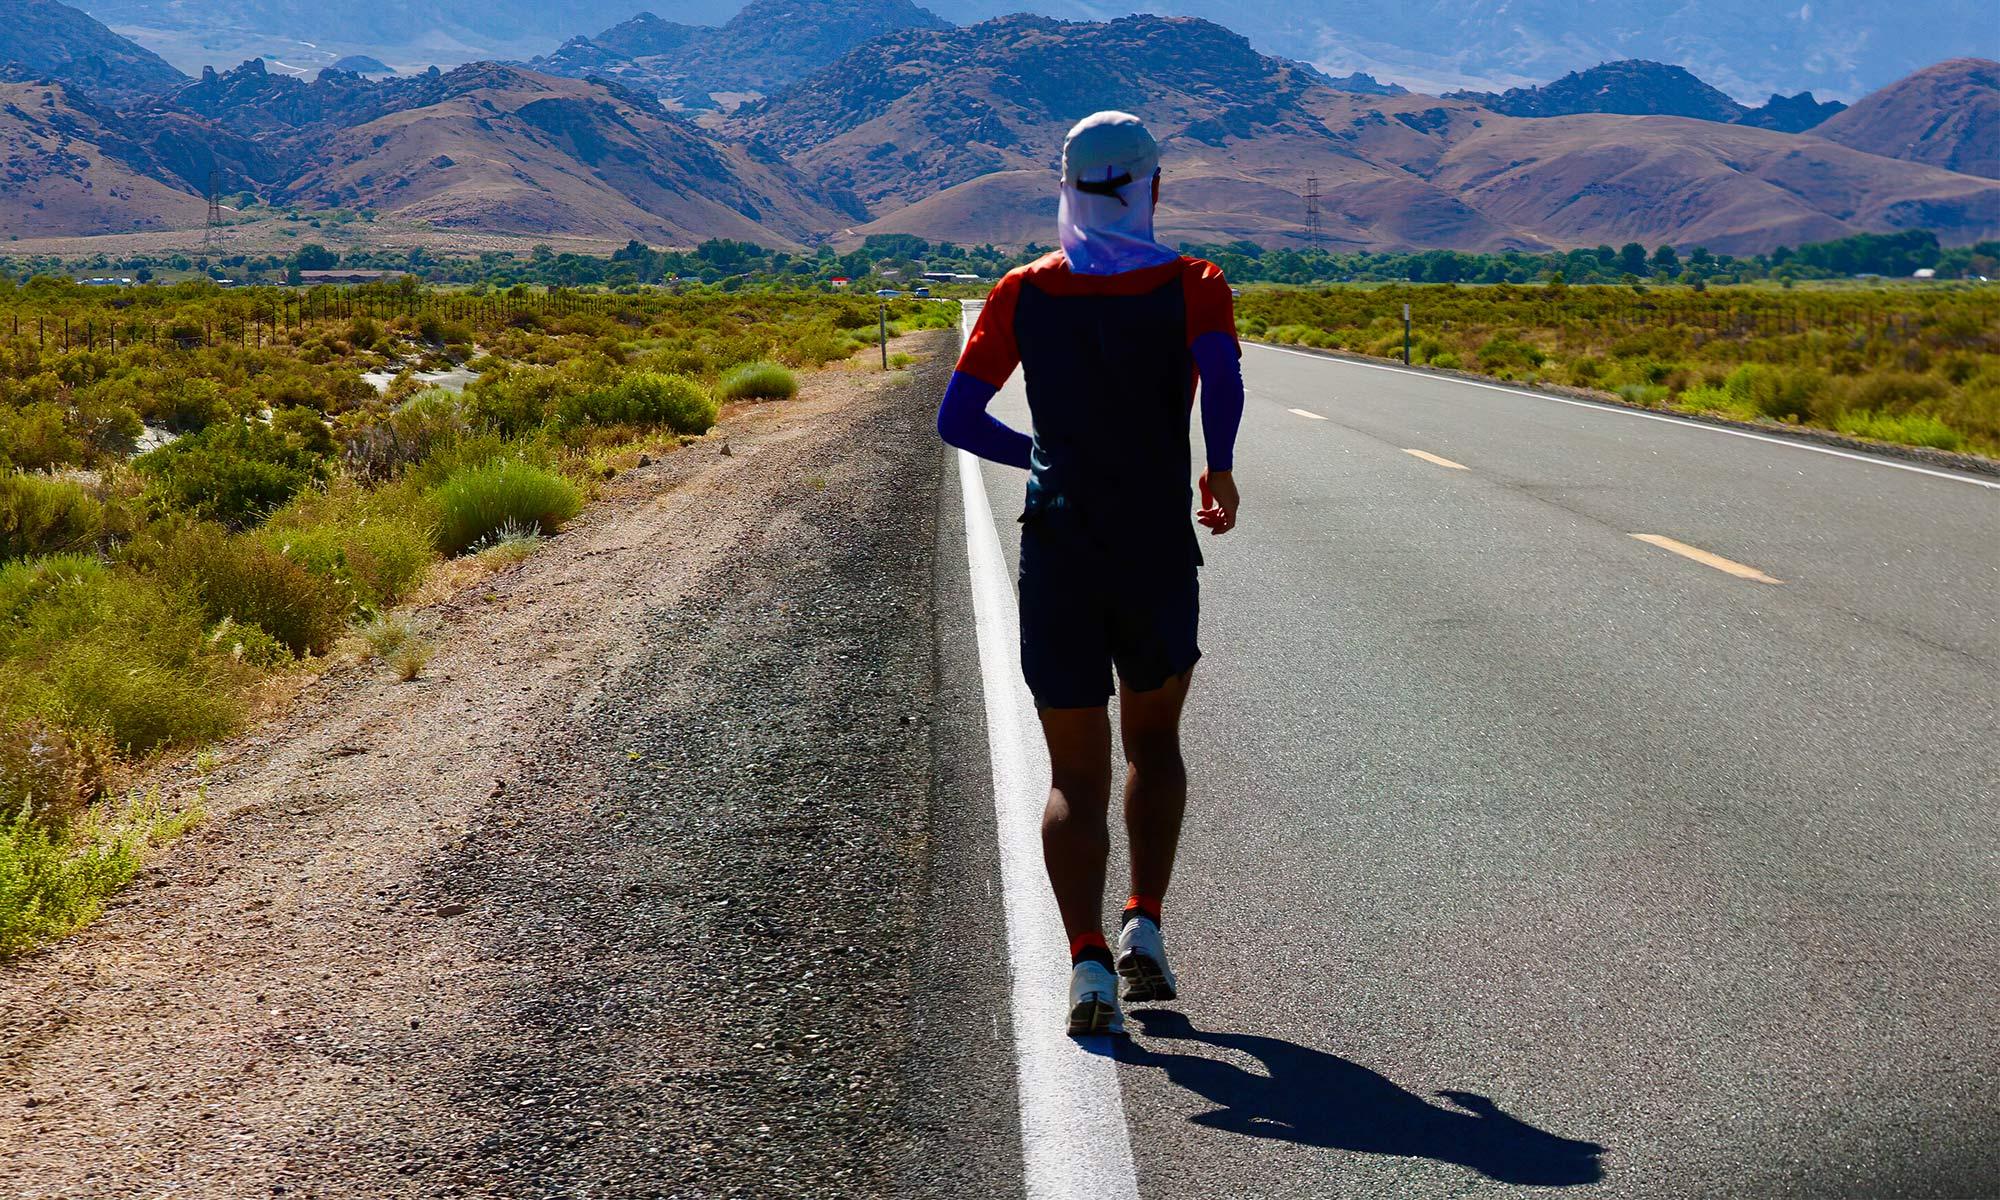 Le Japonais Yoshihiko Ishikawa vainqueur de la Badwater Ultramarathon 2019